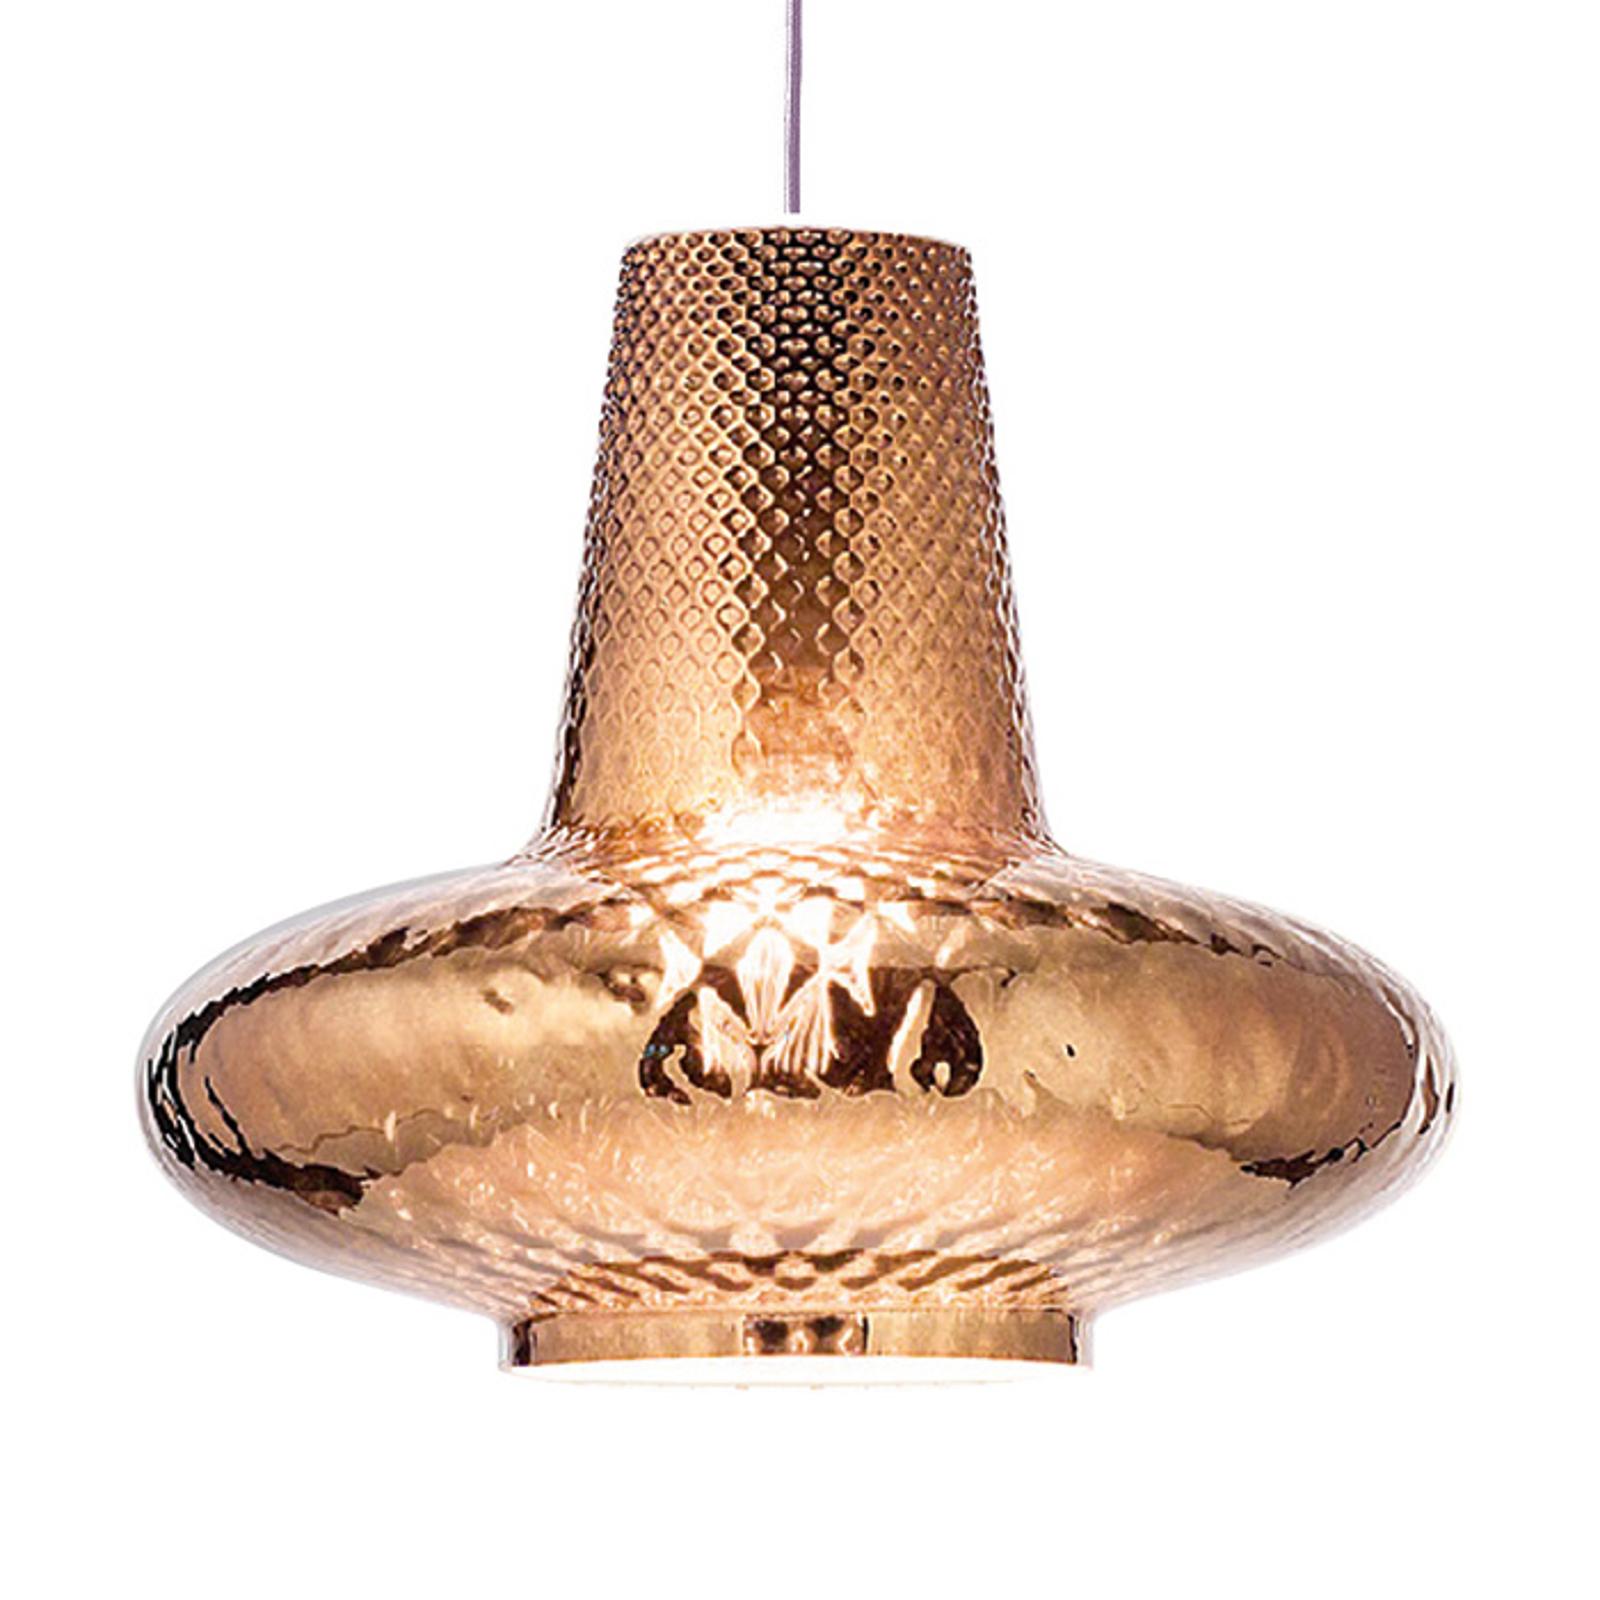 Hanglamp Giulietta 130 cm brons metallic